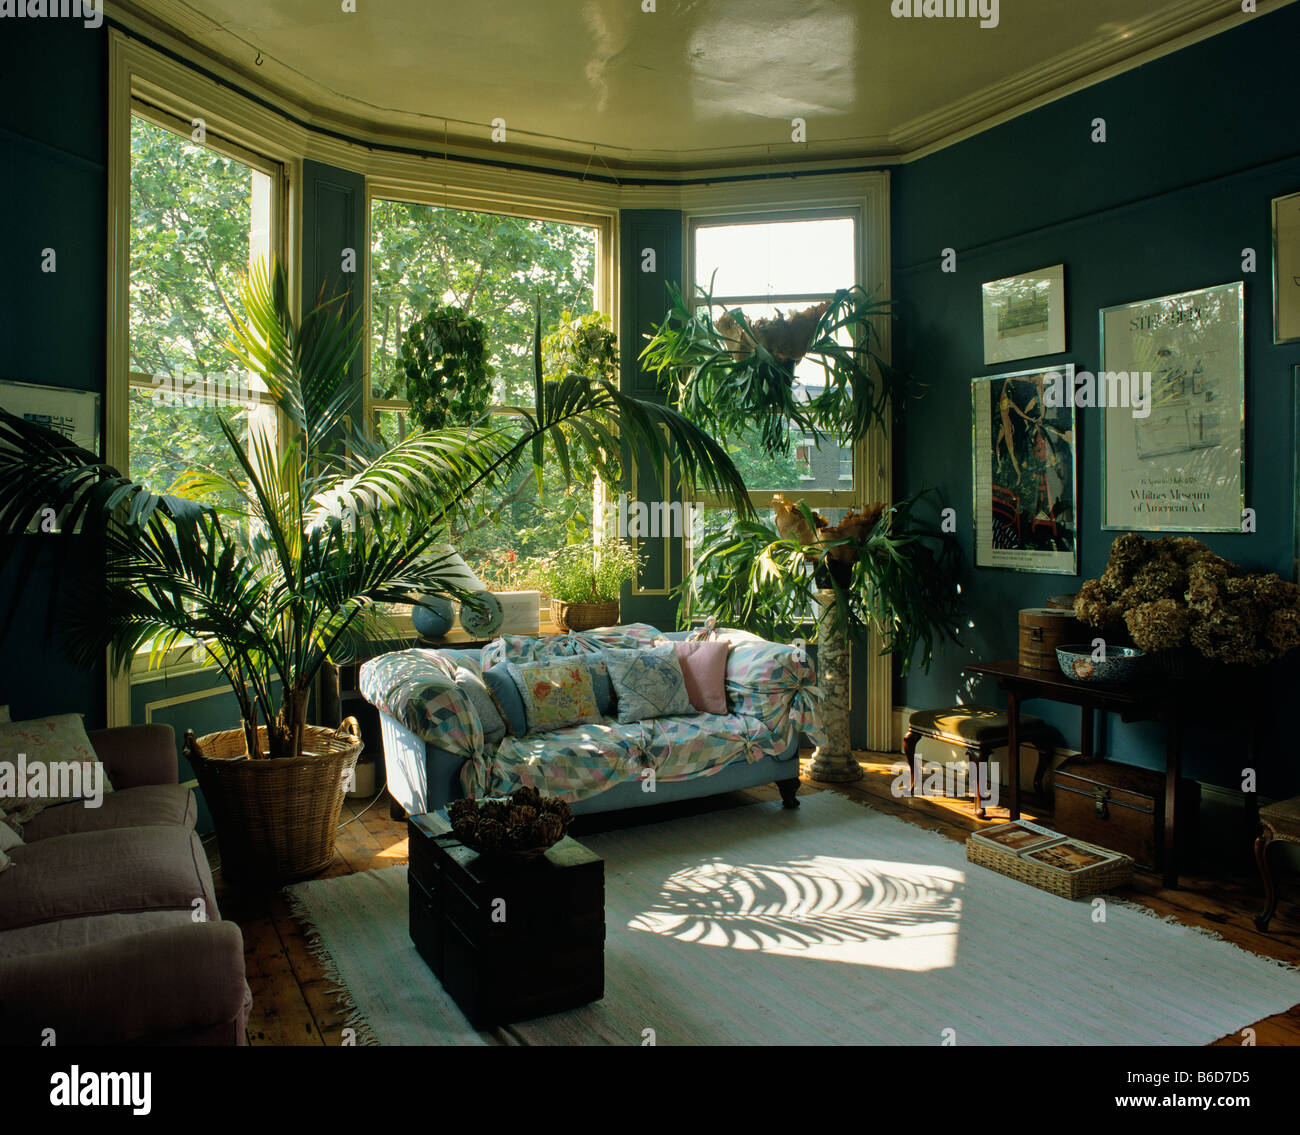 Eighties Style Living Room Interior   Stock Image